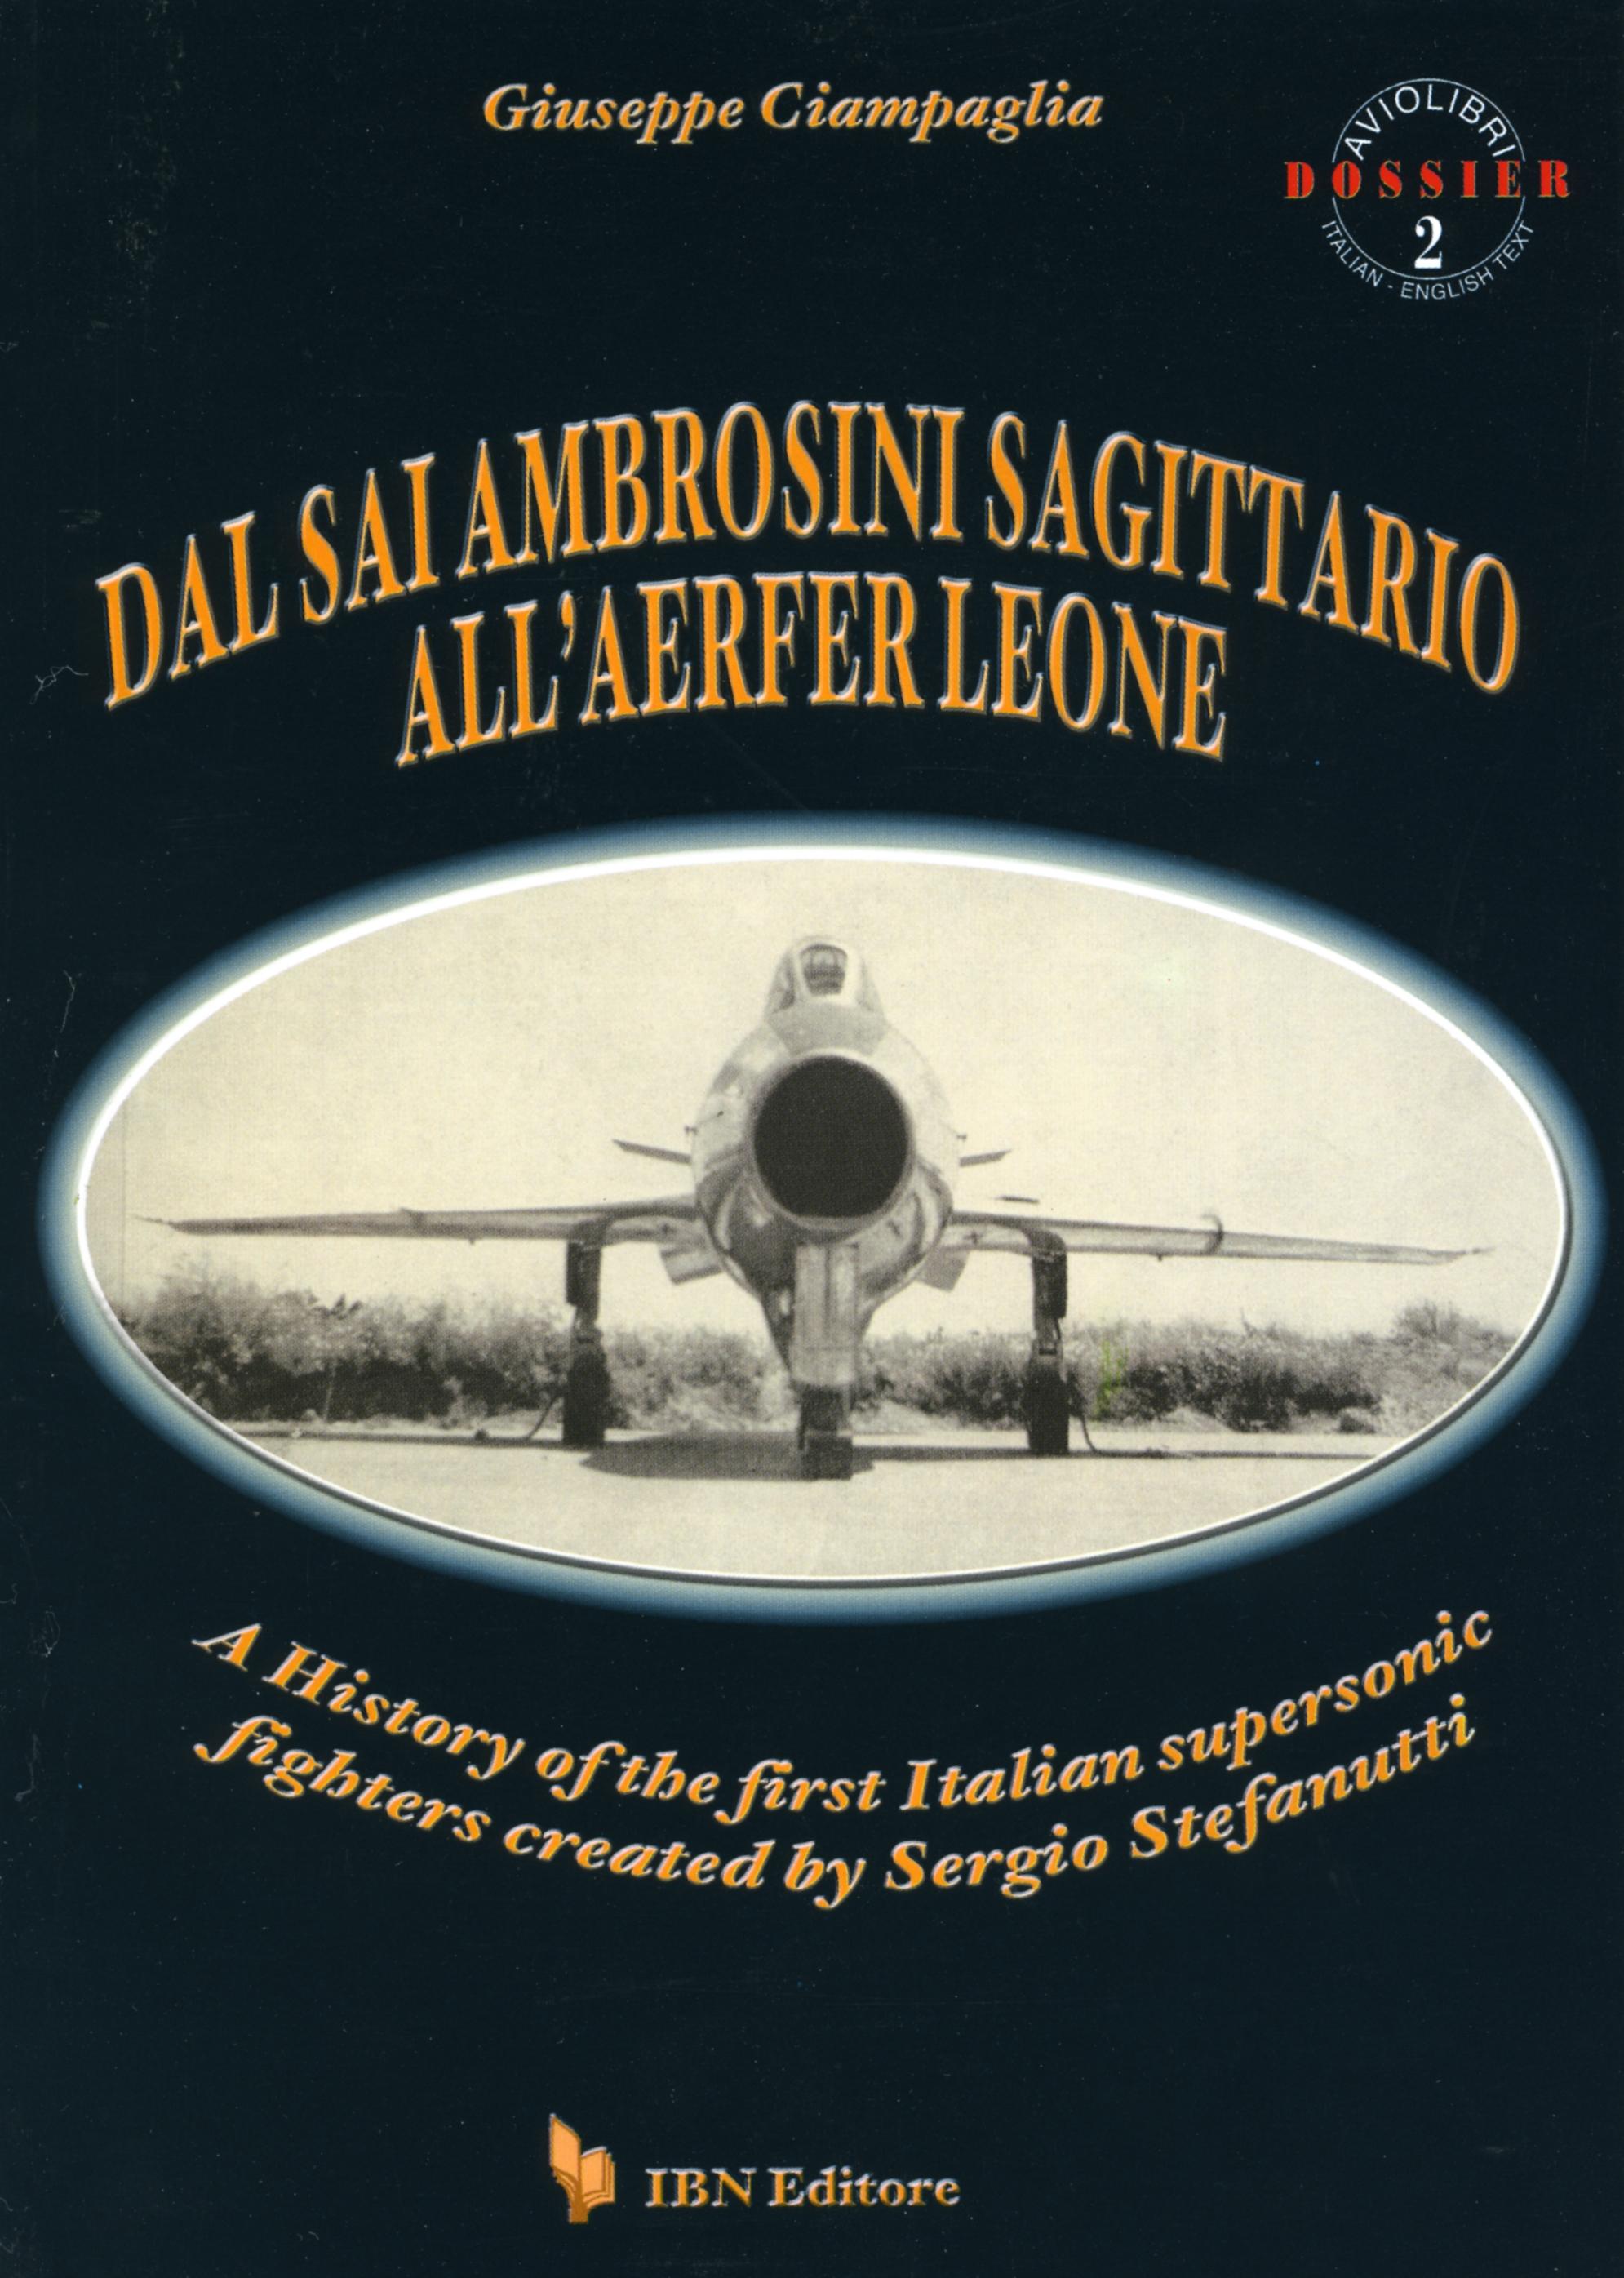 Dal SAI Ambrosini Sagittario all'Aerferleone A History of the first Italian supersonic fighters created by Sergio Stefanutti